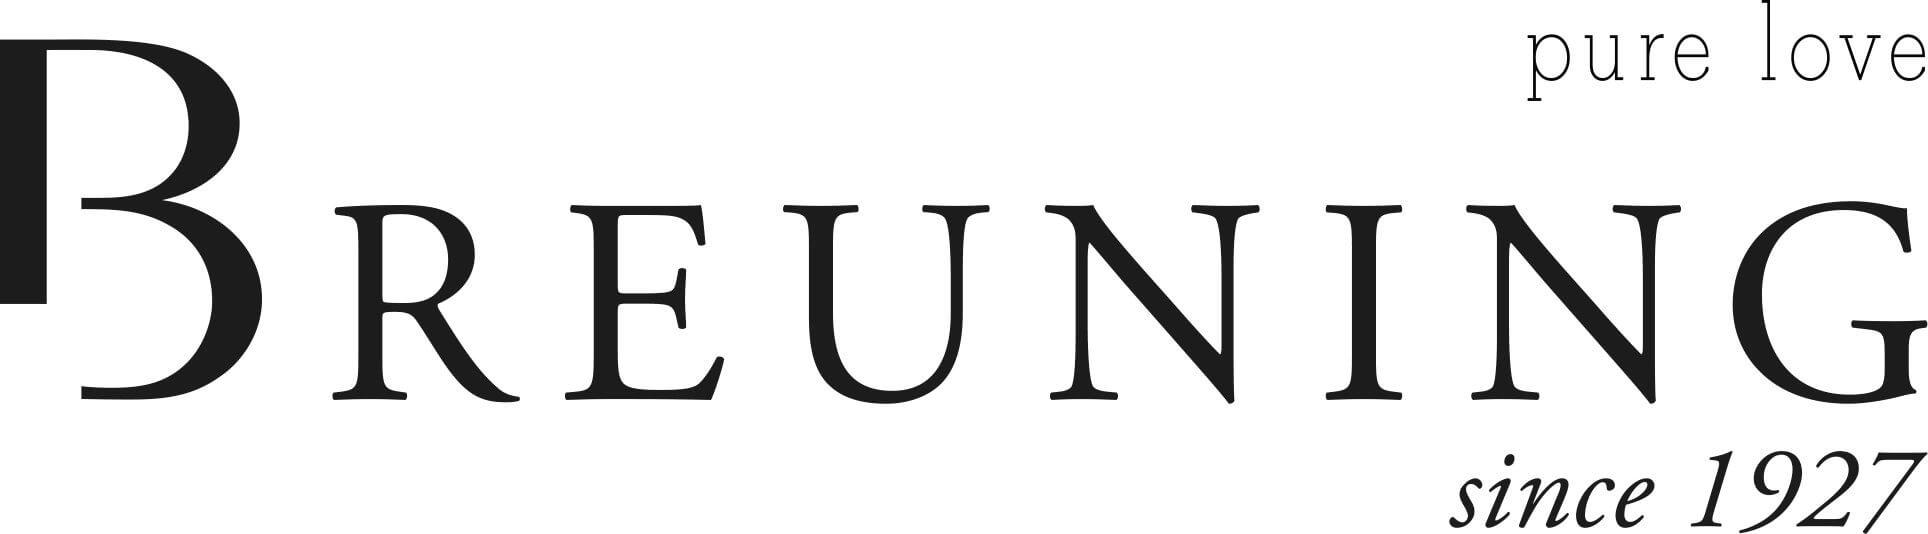 Breuning GmbH